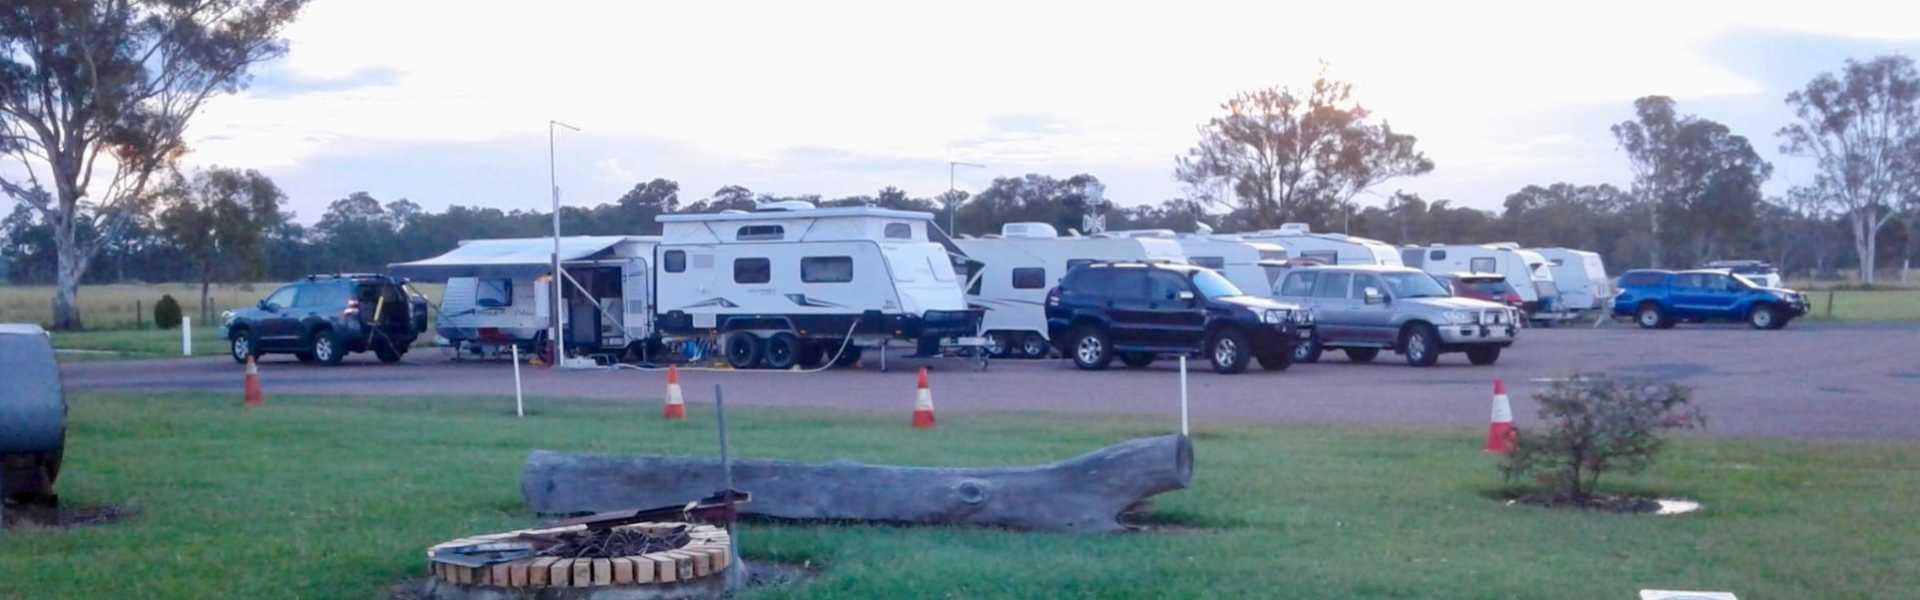 Kui Parks, Cheery Nomad RV Park & Farmstay, Maryborough, Park